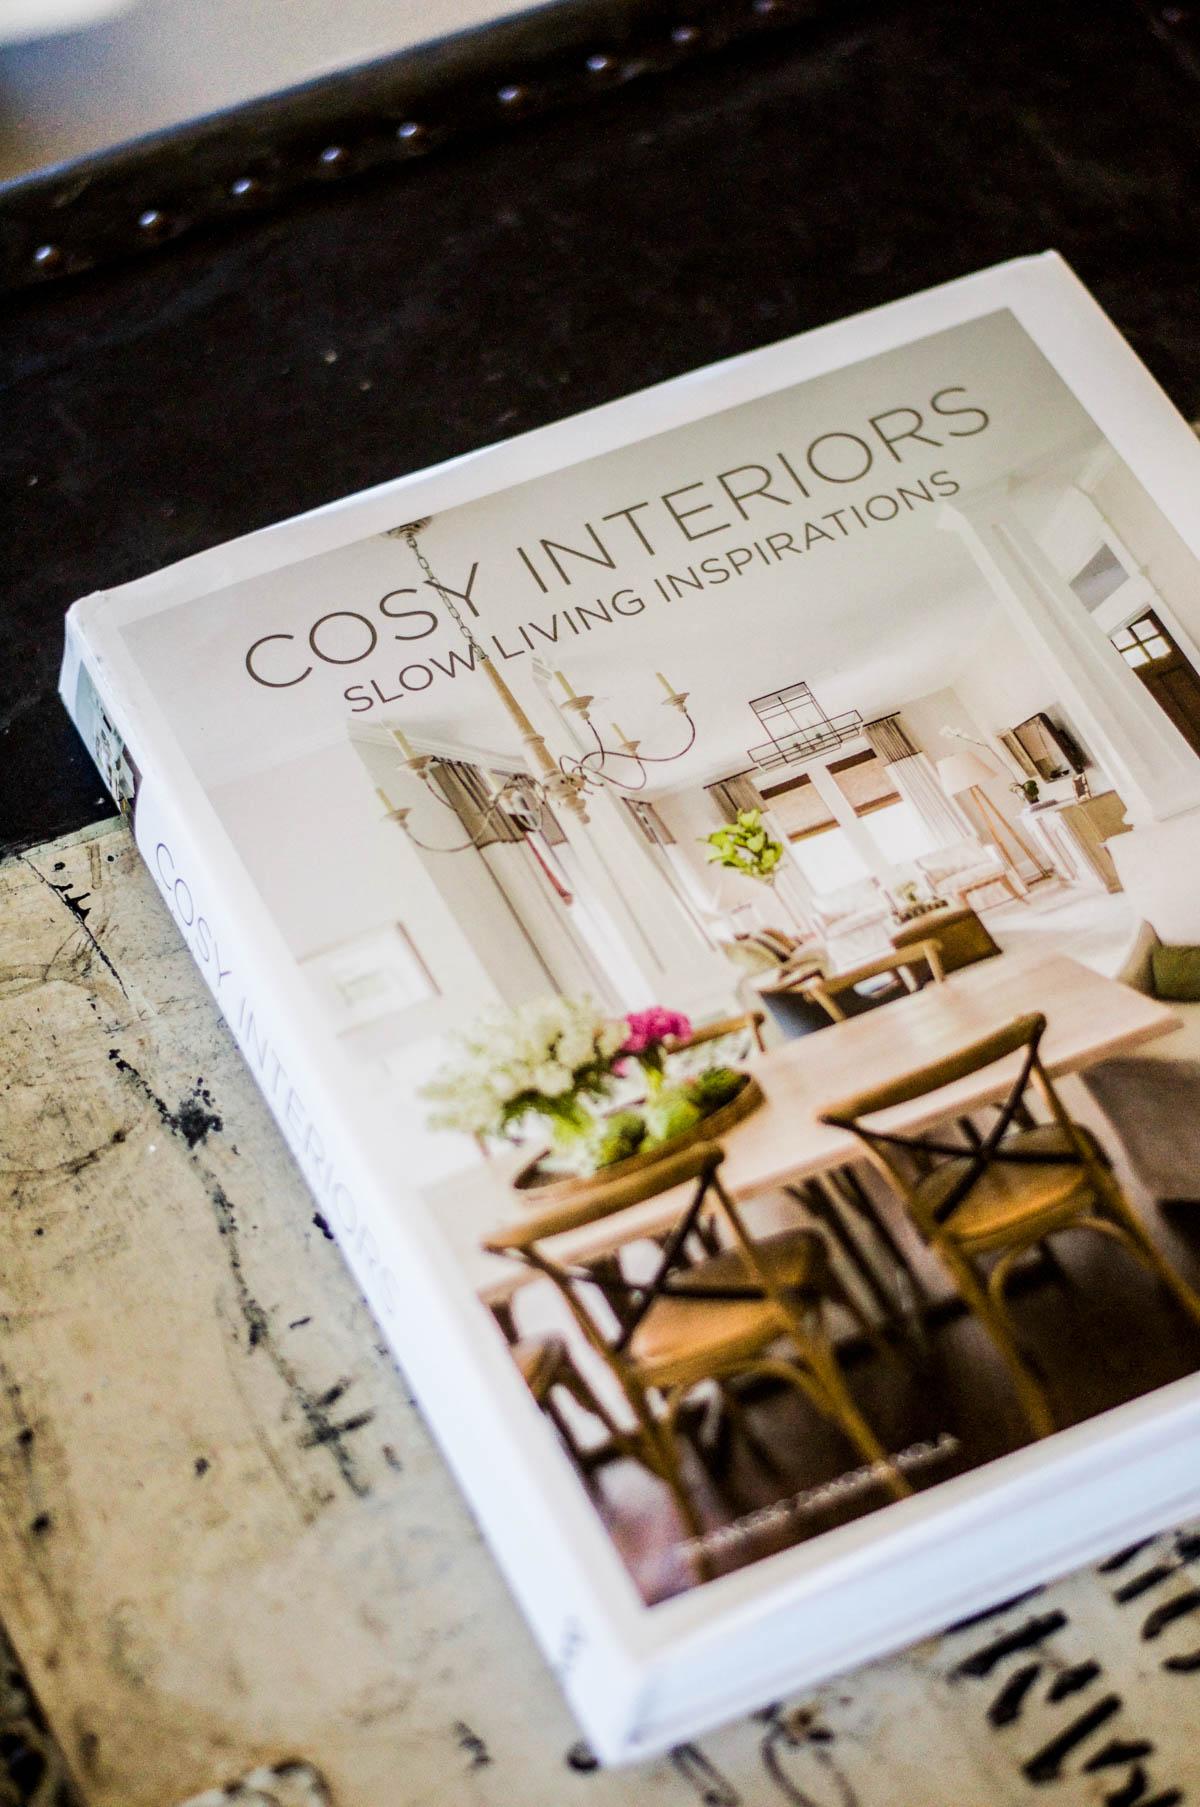 Cosy Interiors Book